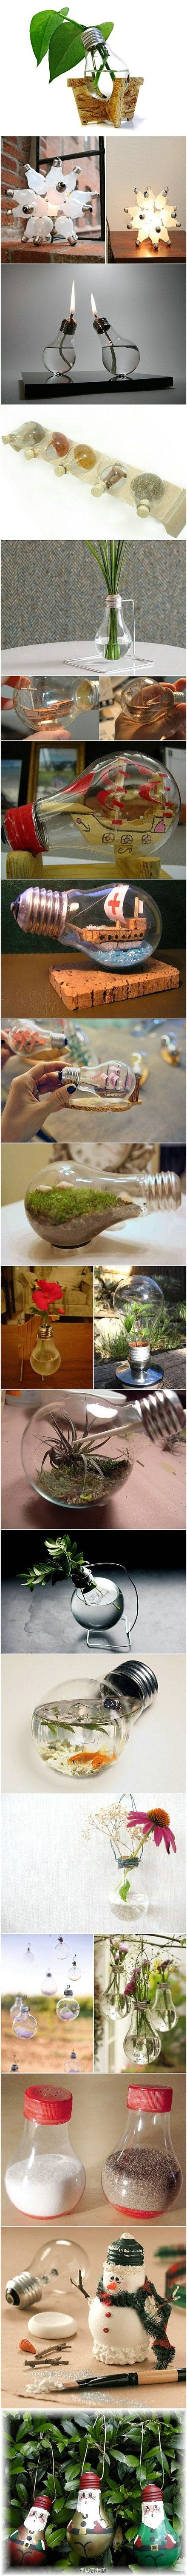 best ideas images on pinterest creative ideas good ideas and